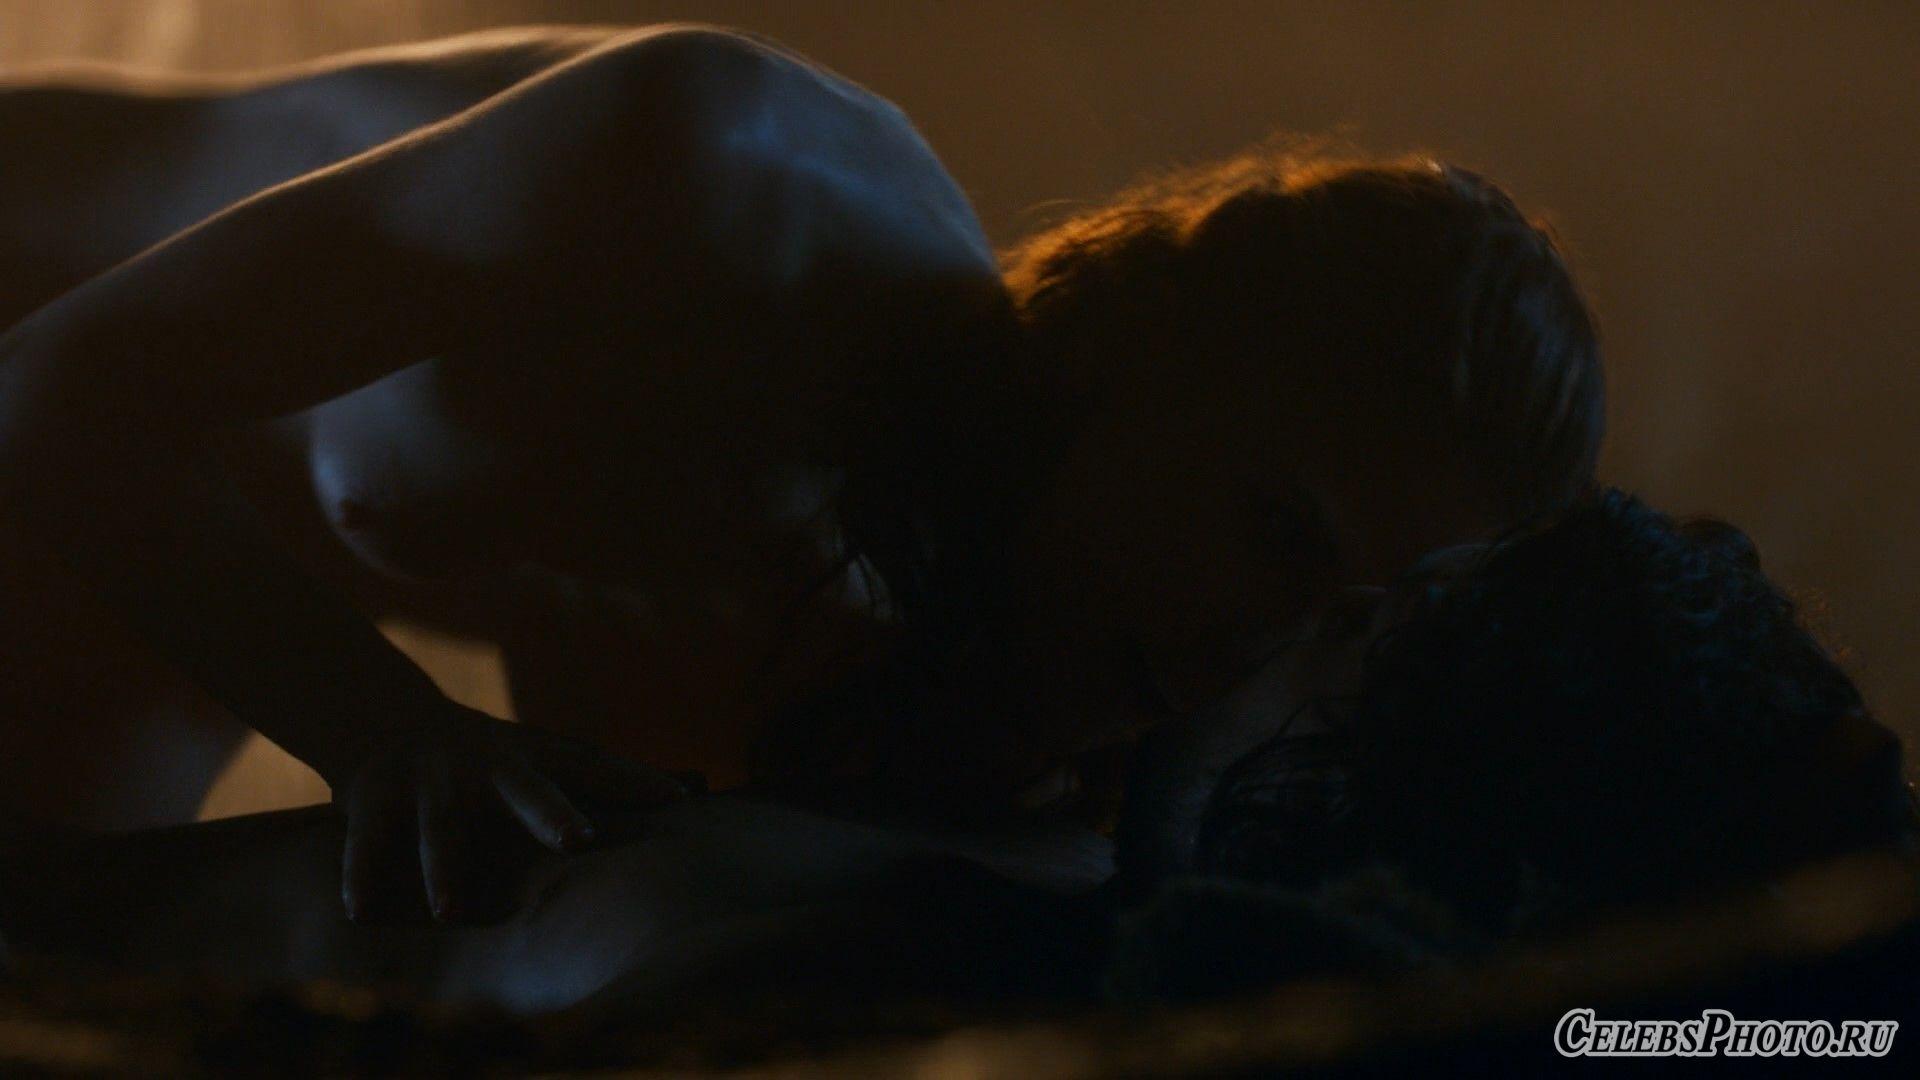 Игра престолов – Роуз Лесли